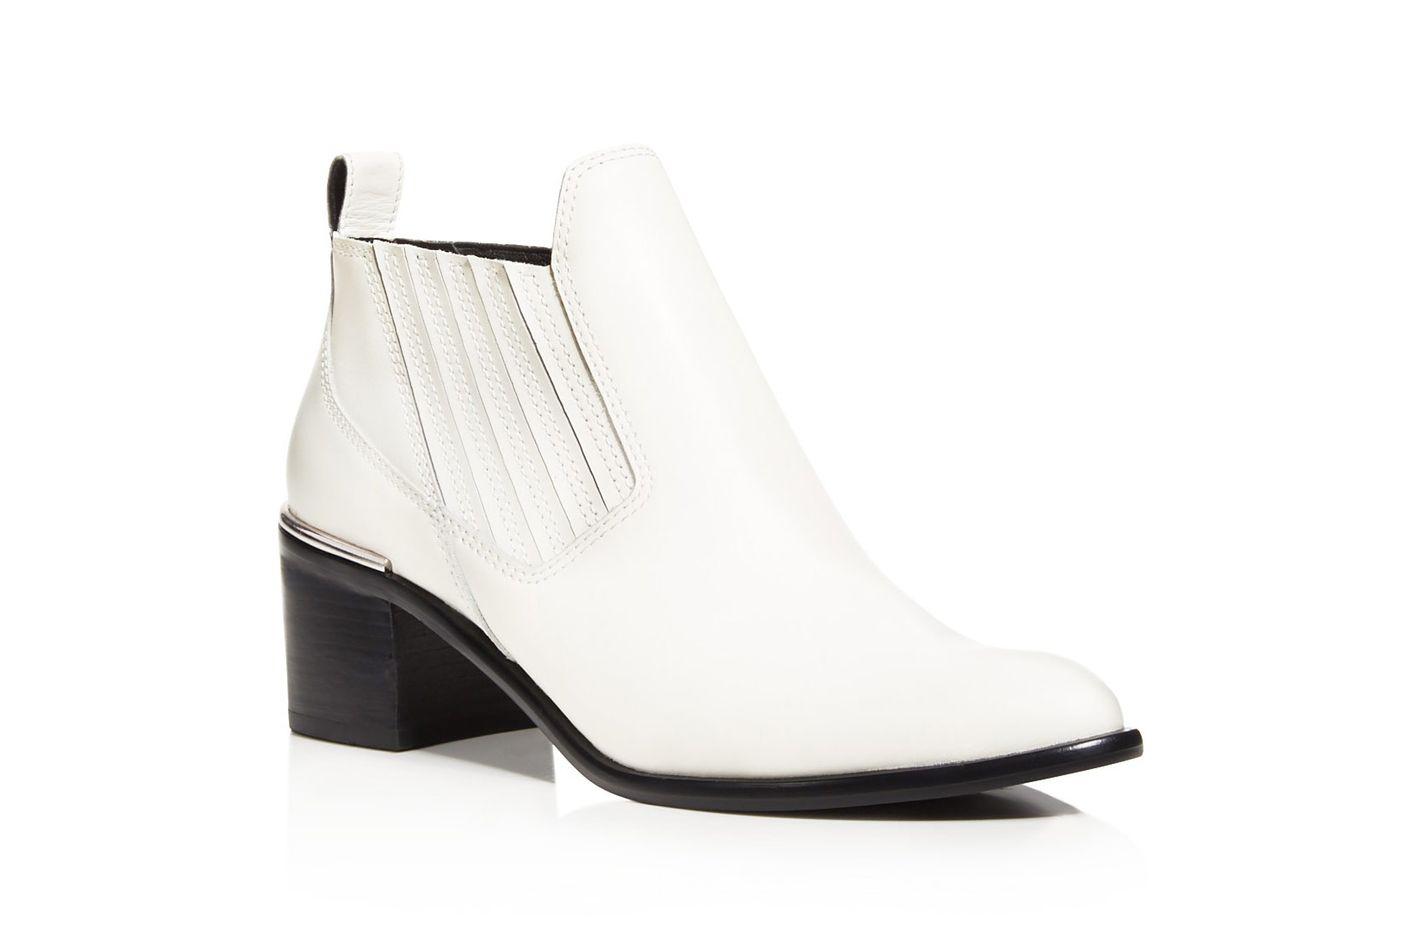 Dolce Vita 'Percey' Boots